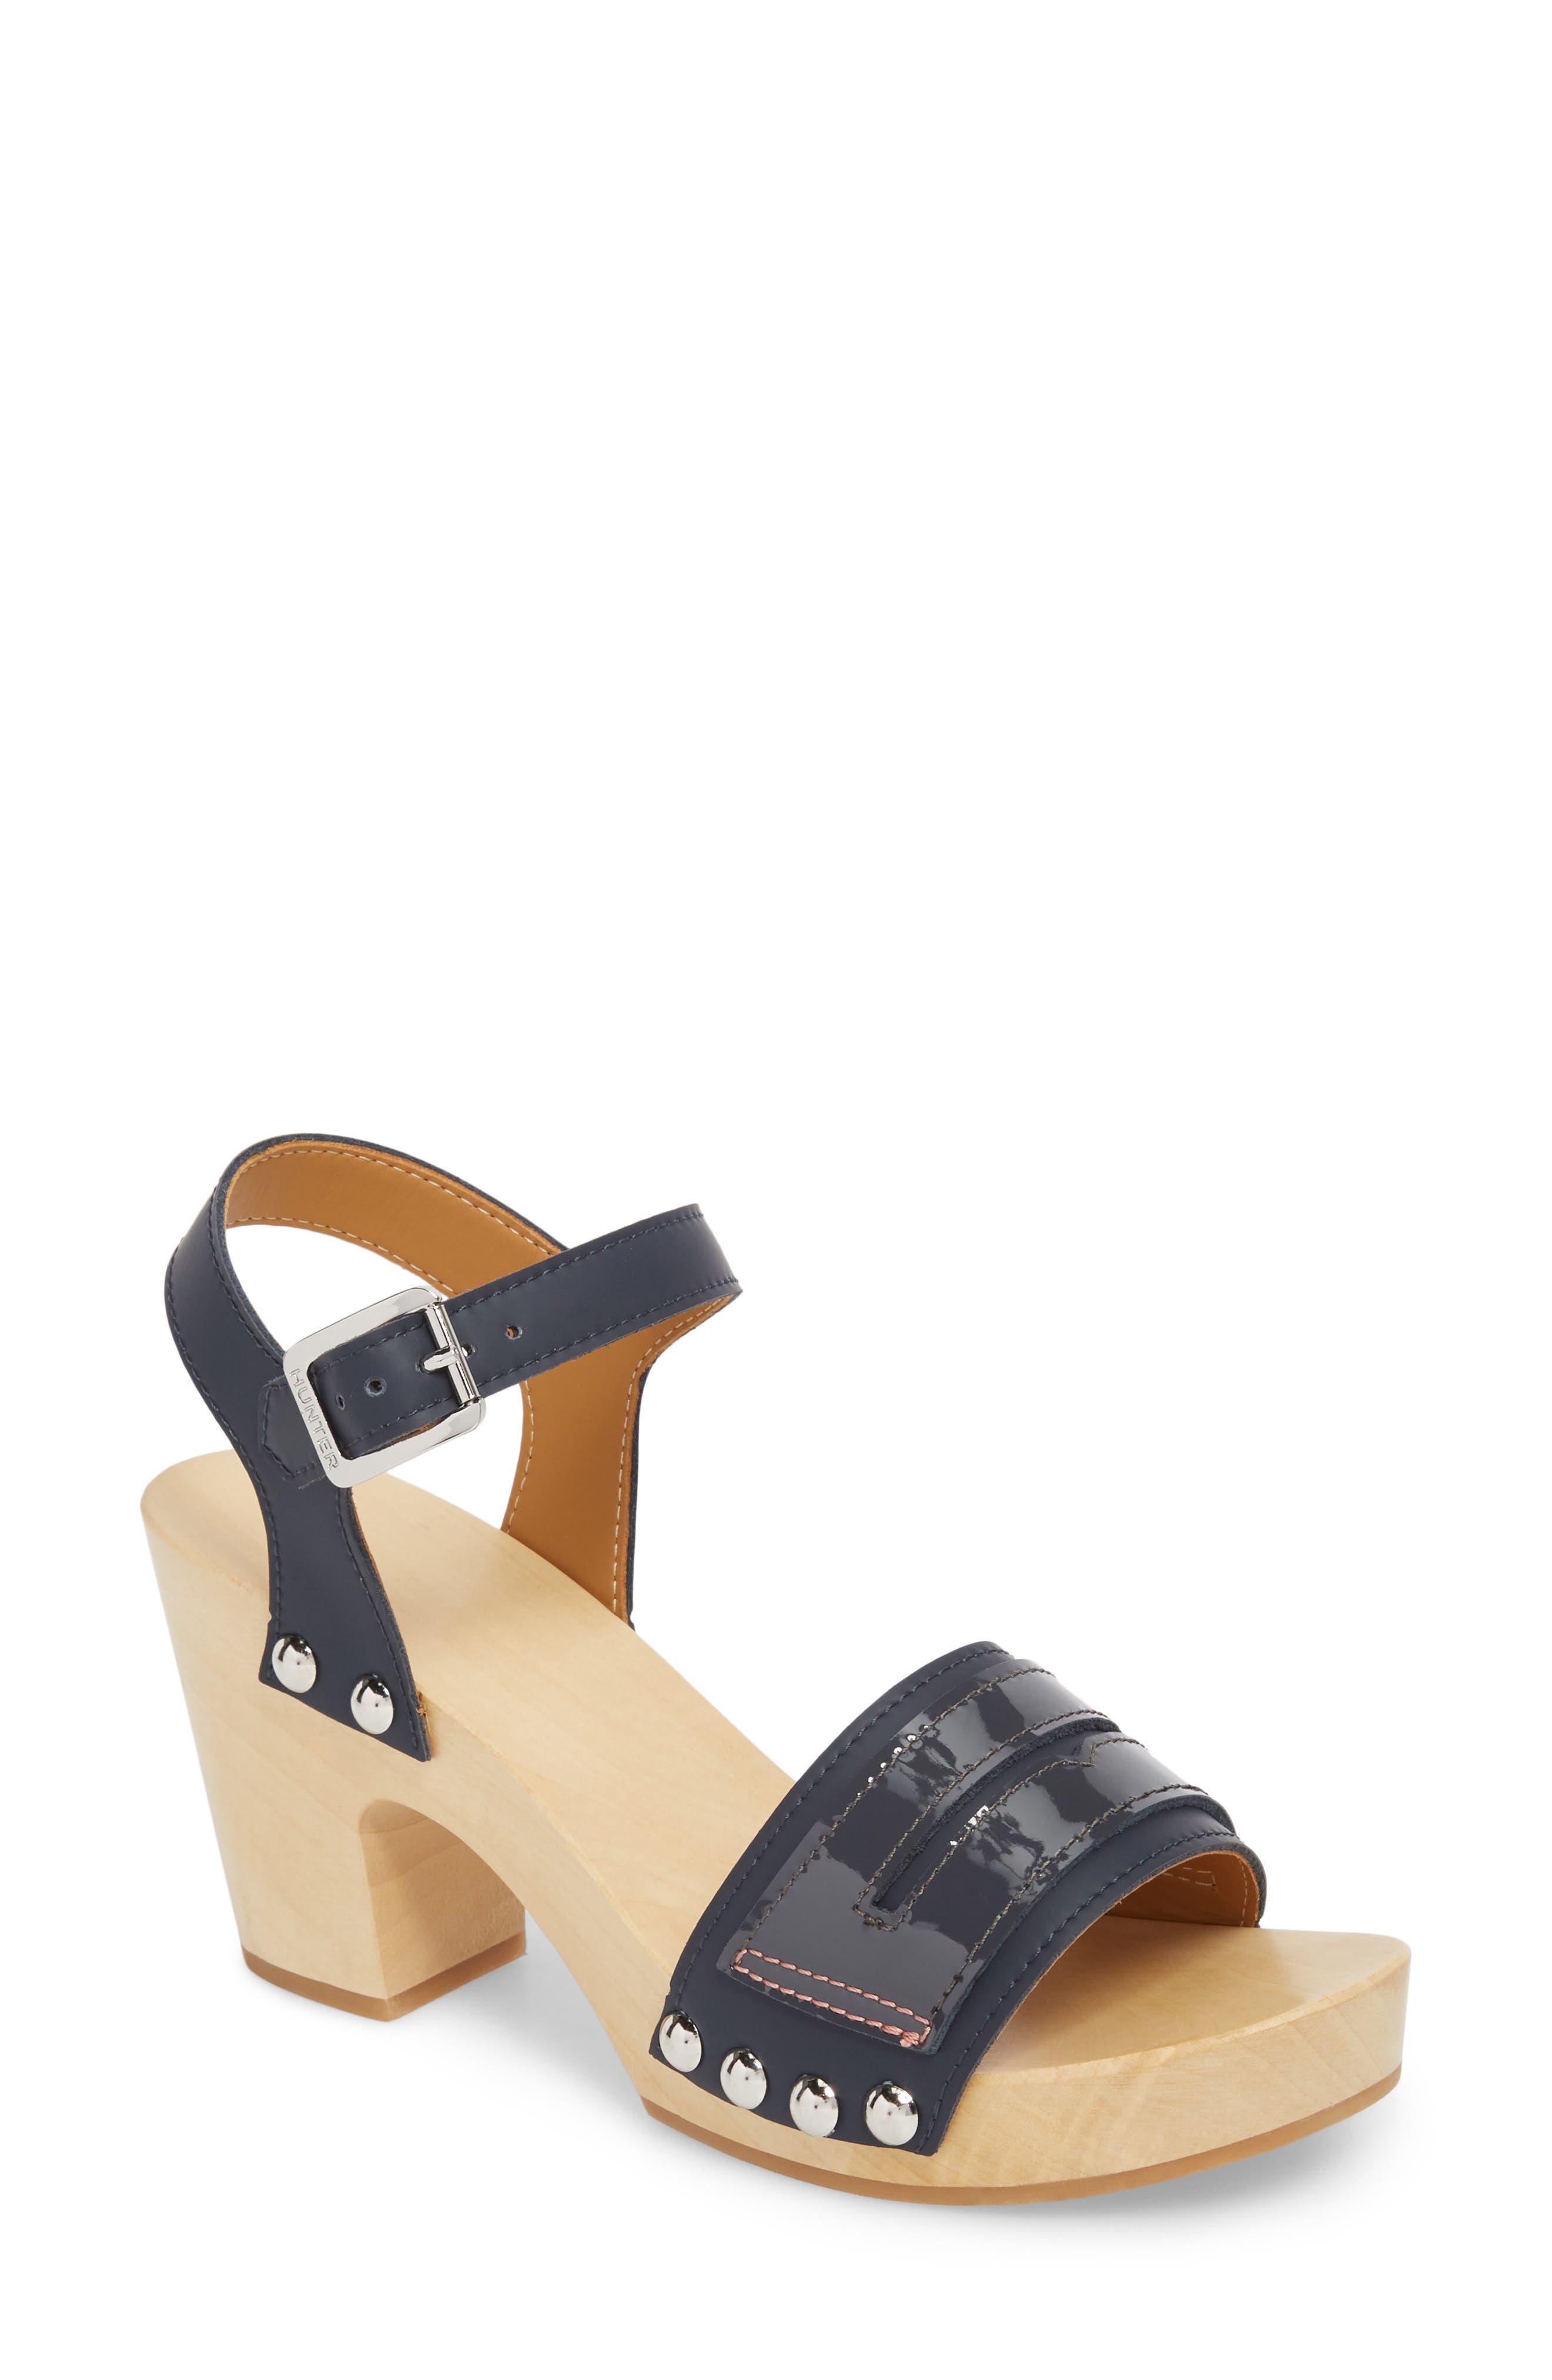 Refined Penny Loafer Clog Sandal,                         Main,                         color, NAVY